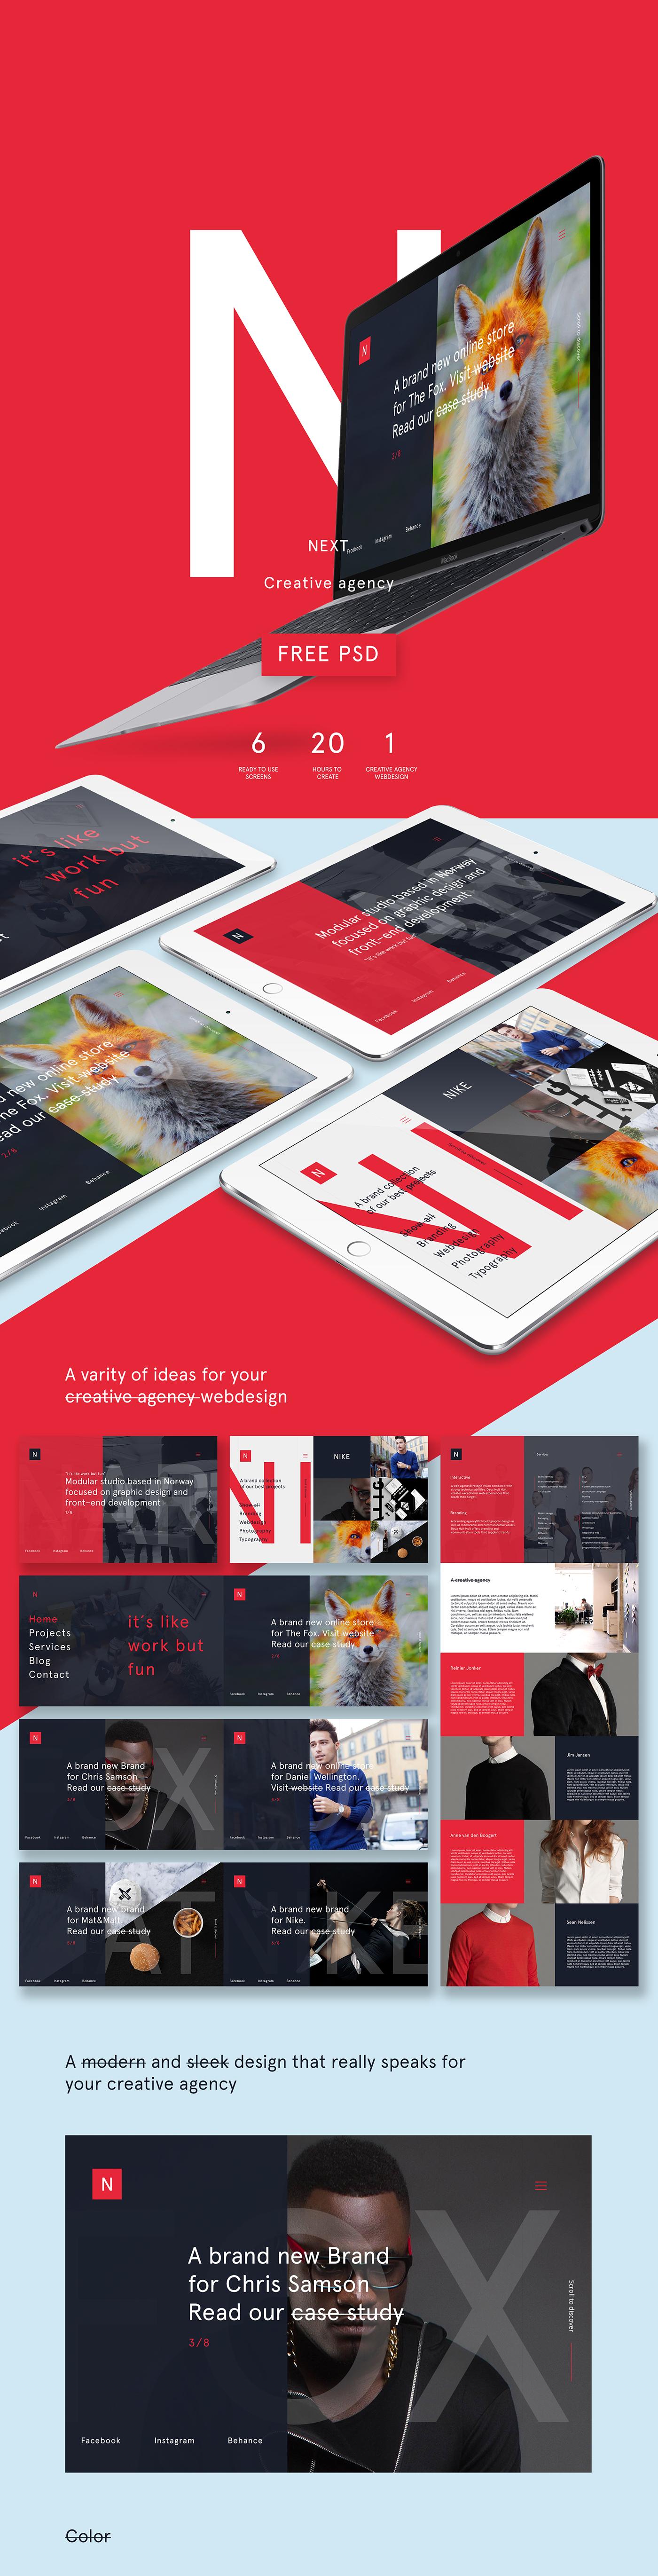 creative agency psd free on behance